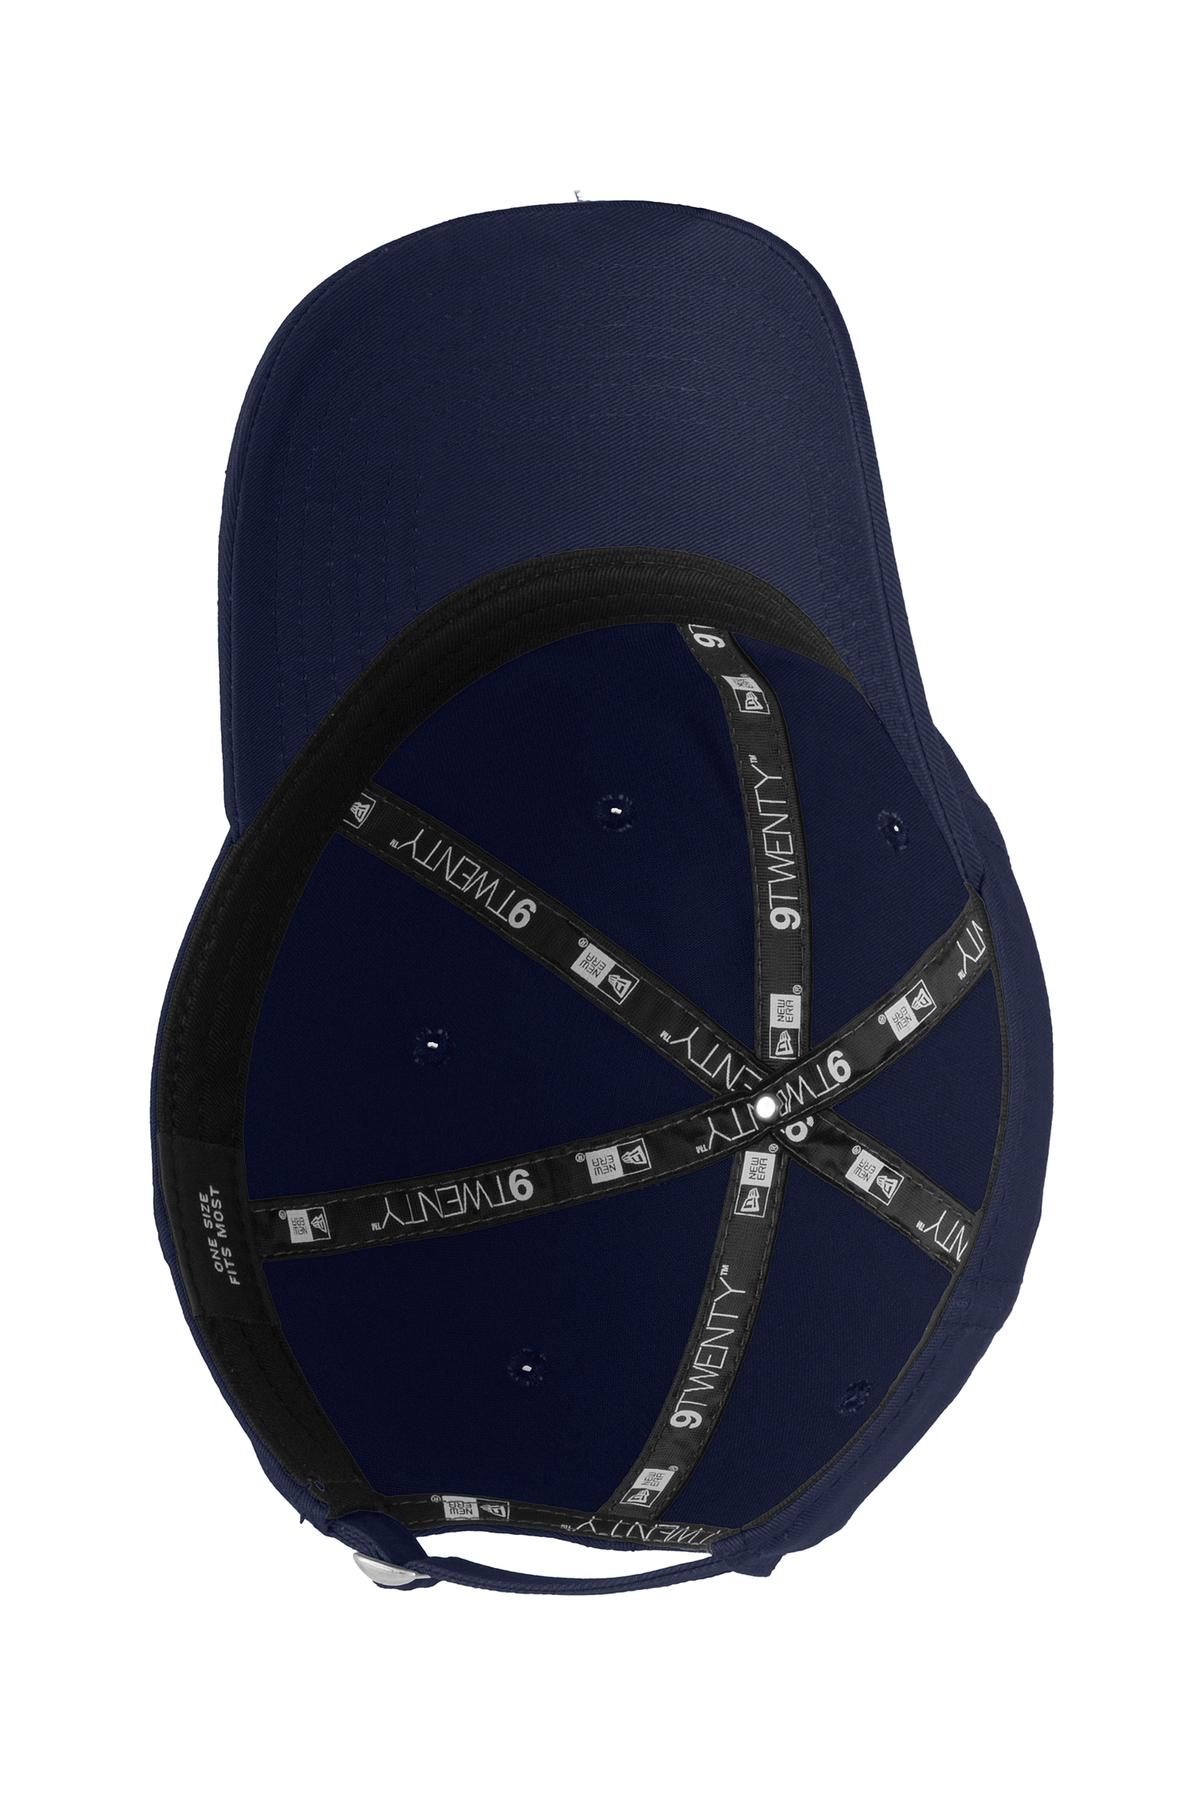 324023b1e55 New Era® - Adjustable Unstructured Cap